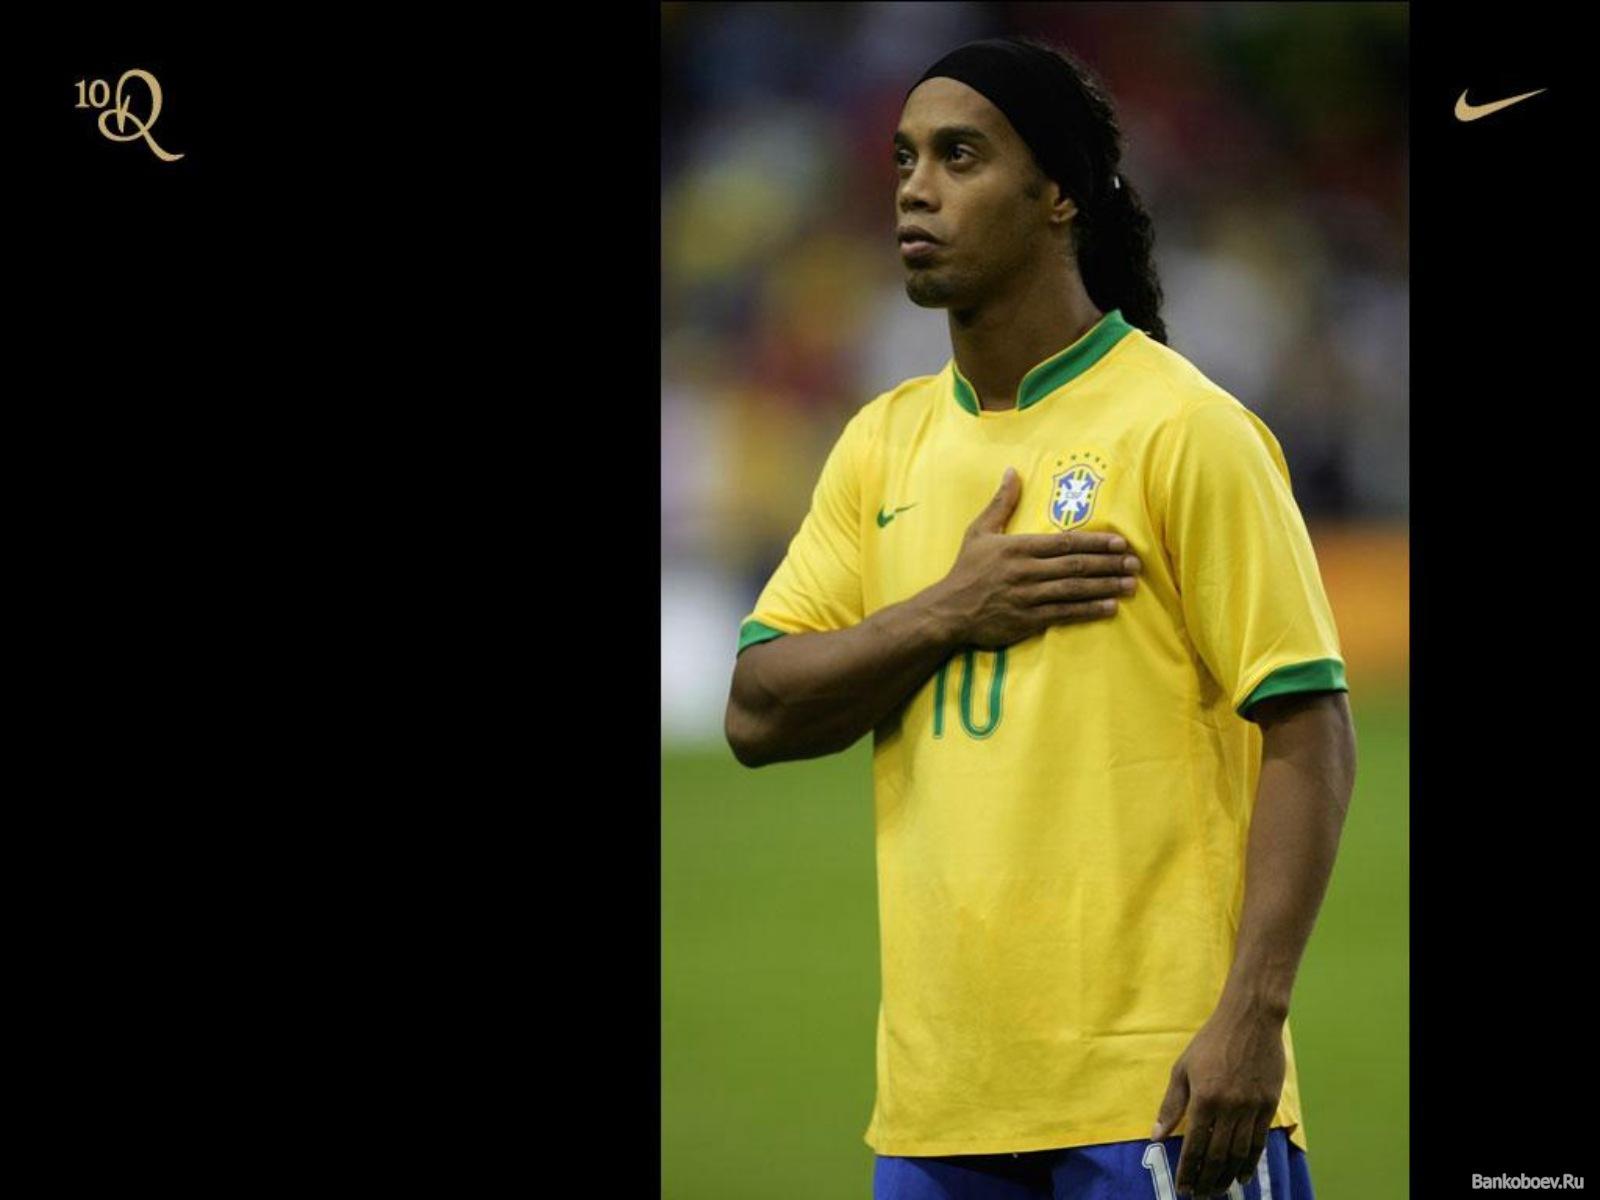 The Football Player Of Atletico Mineiro Ronaldinho